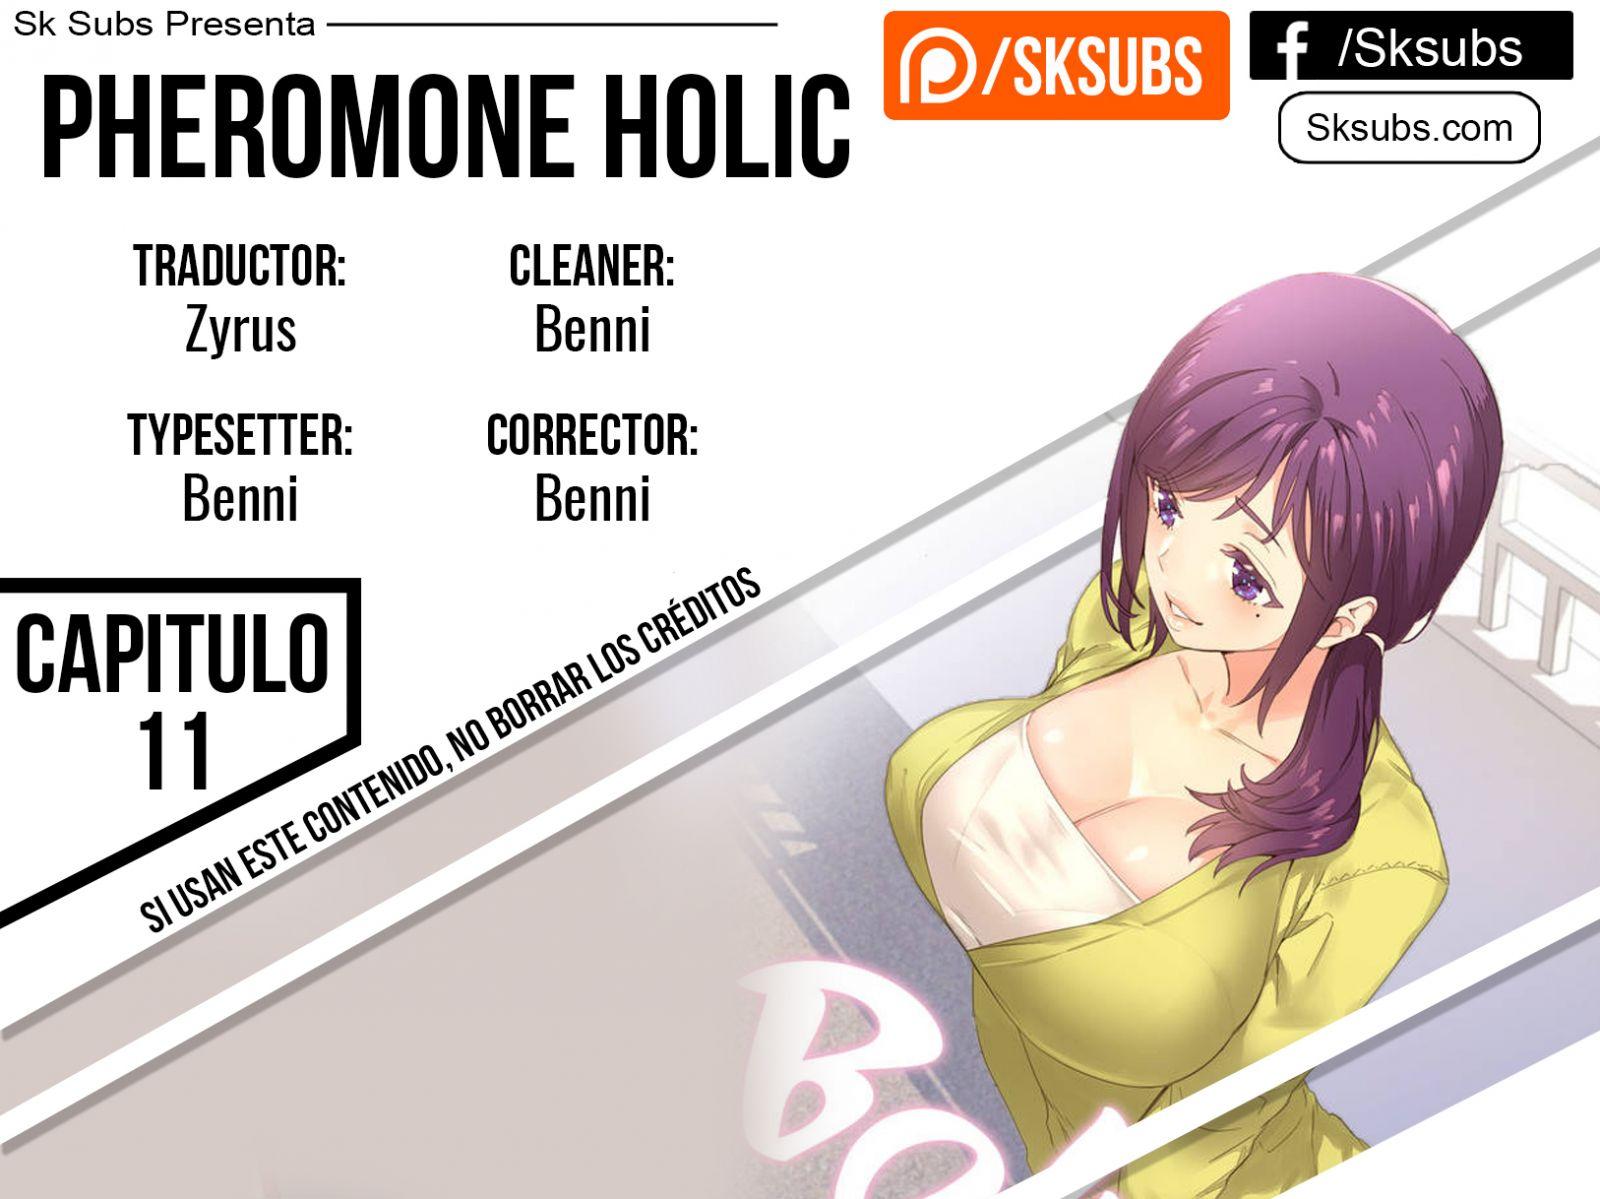 https://c9.mangatag.com/es_manga/pic5/58/25146/637408/c84f741b048a0721739ac52c241ba5df.jpg Page 1